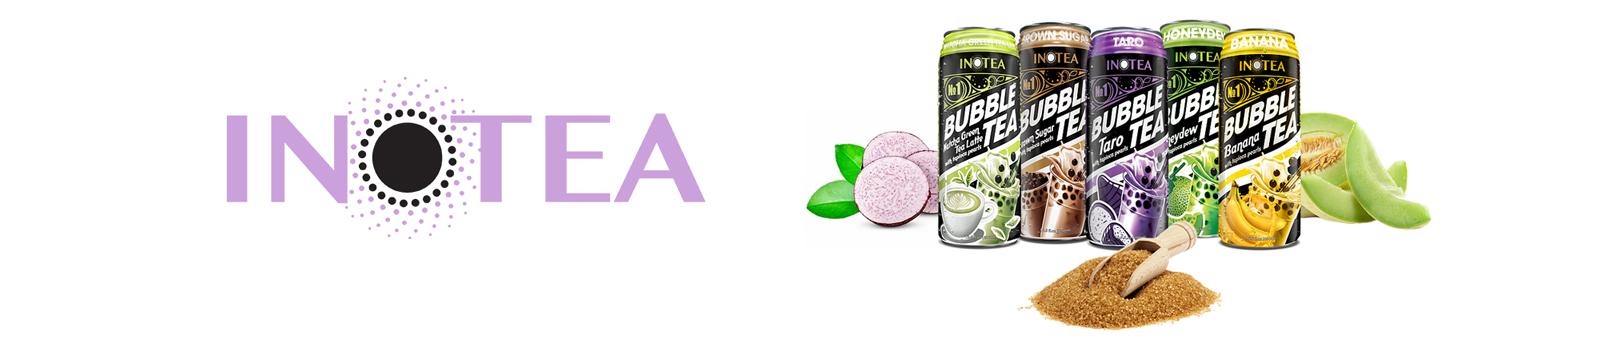 inotea bubble tea intro